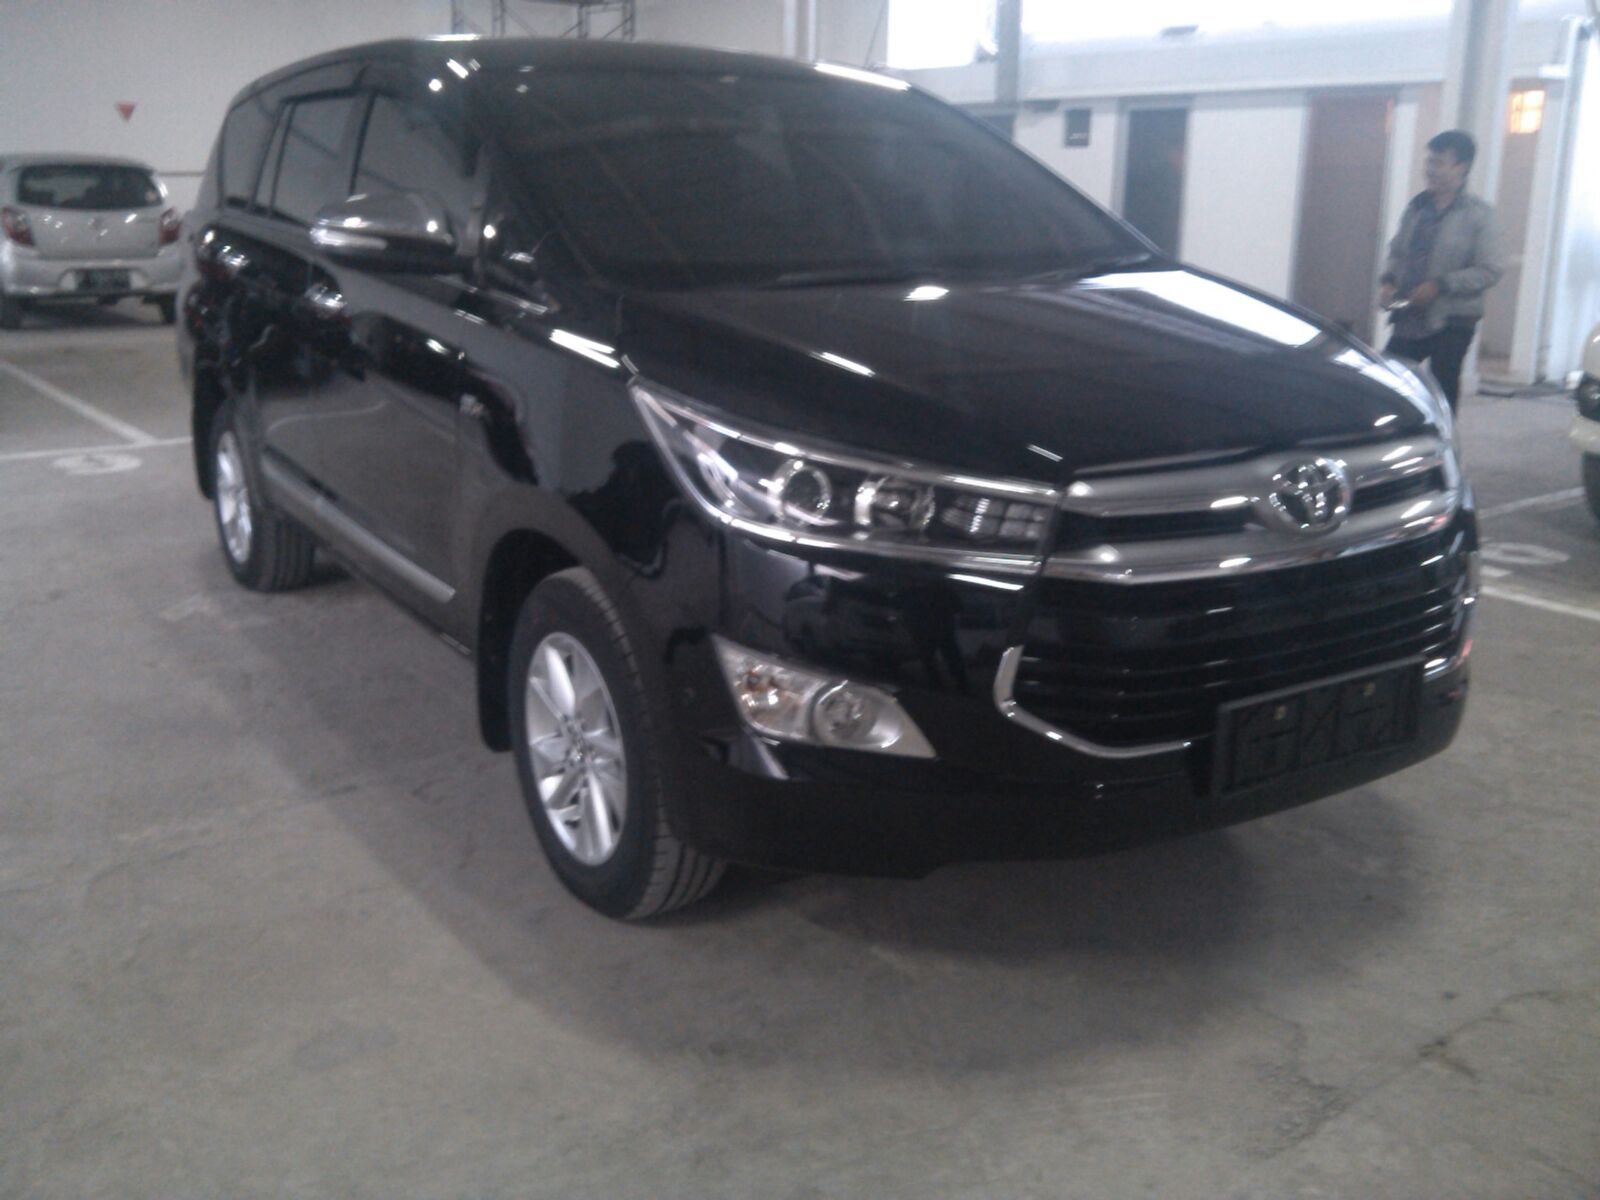 Jual All New Kijang Innova Grand Avanza Warna Harga Toyota Promo